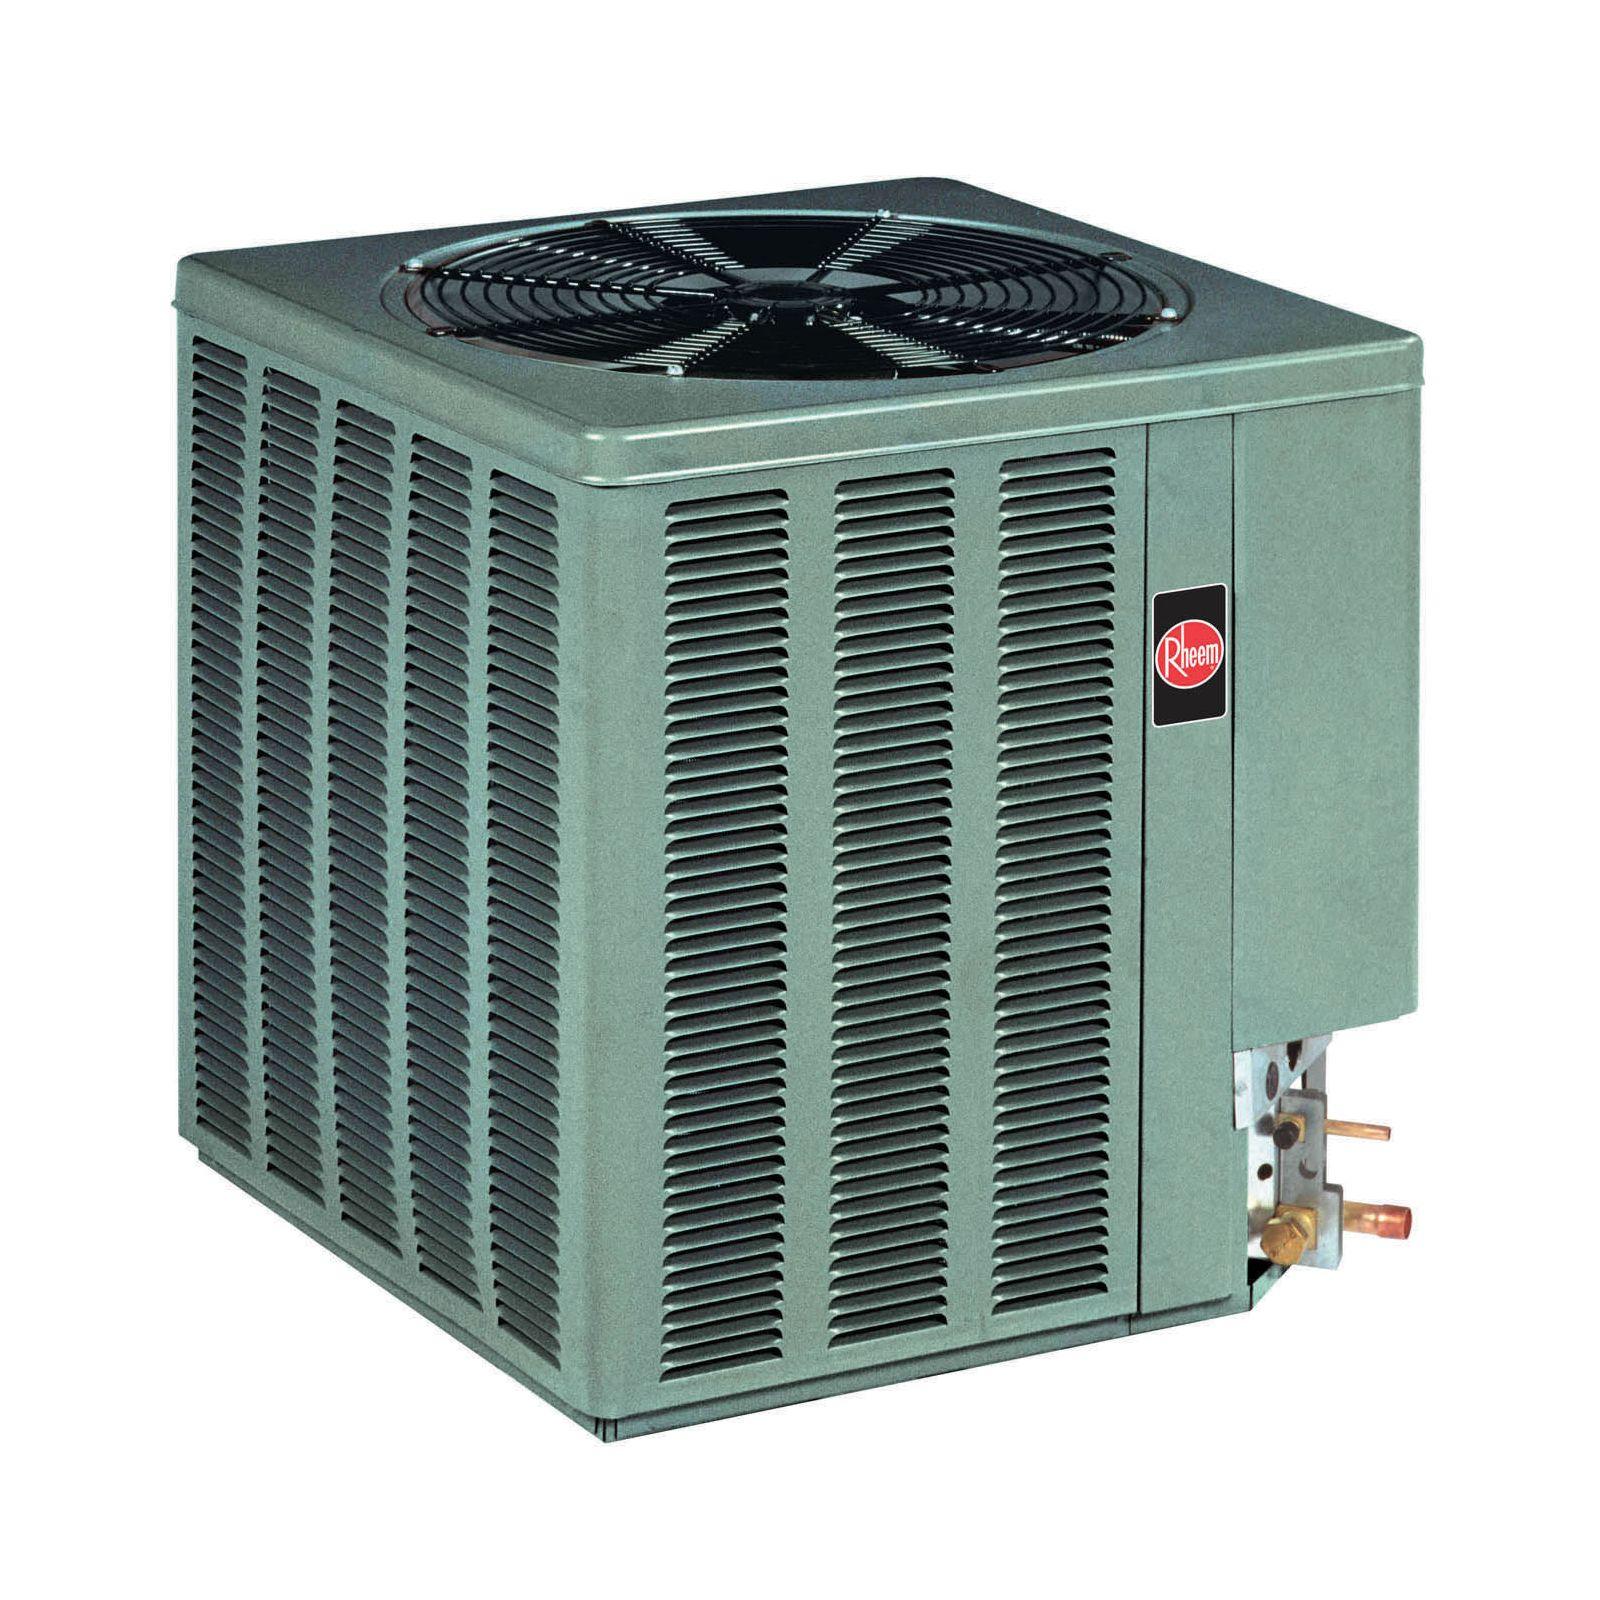 Rheem 15PJL18A01 - Value Series 1 1/2 Ton, 15 SEER, R410a Heat Pump ...